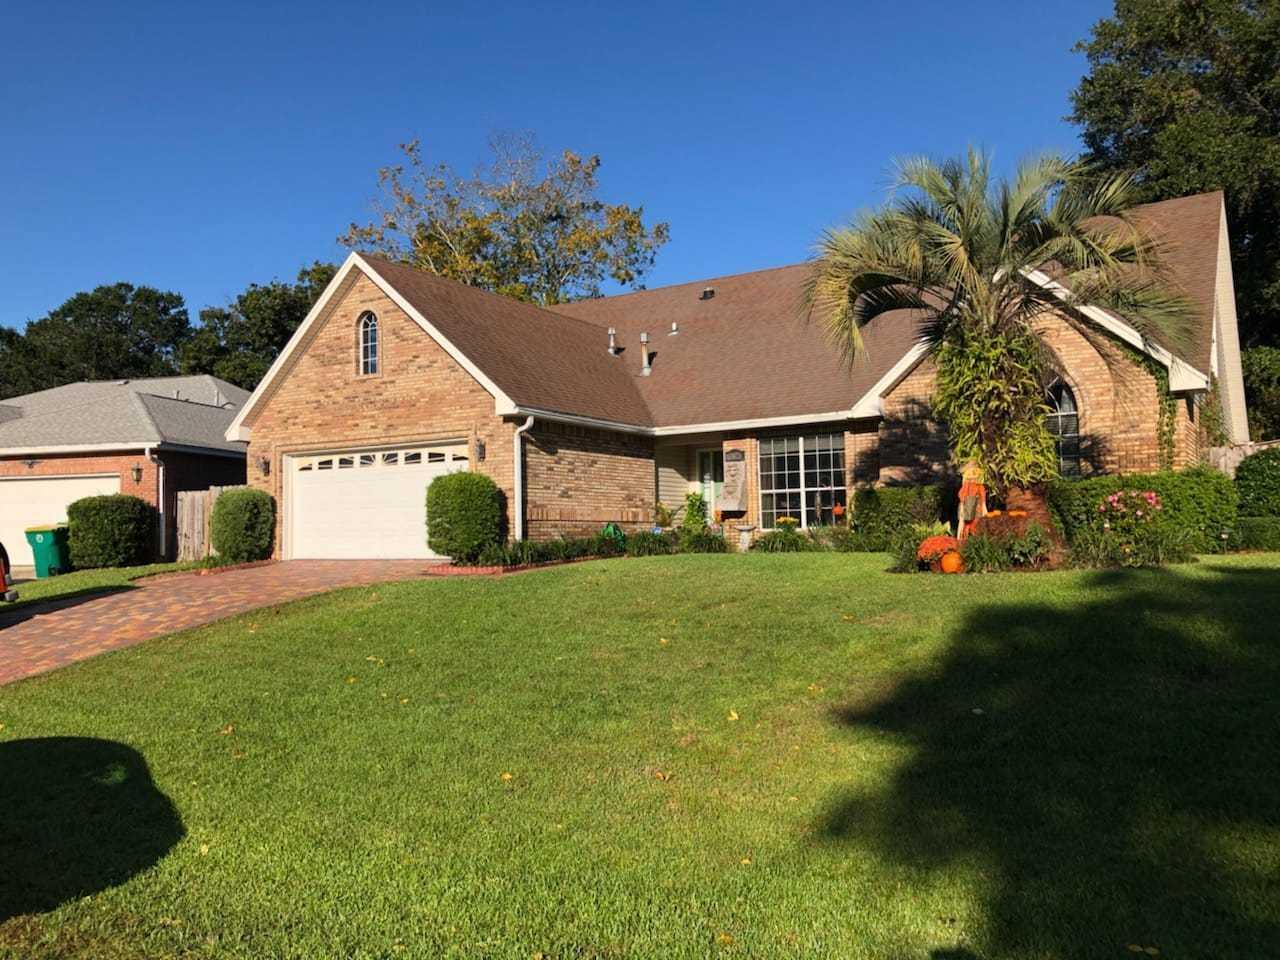 2812  Jack Nicklaus Way, Eglin AFB, Florida